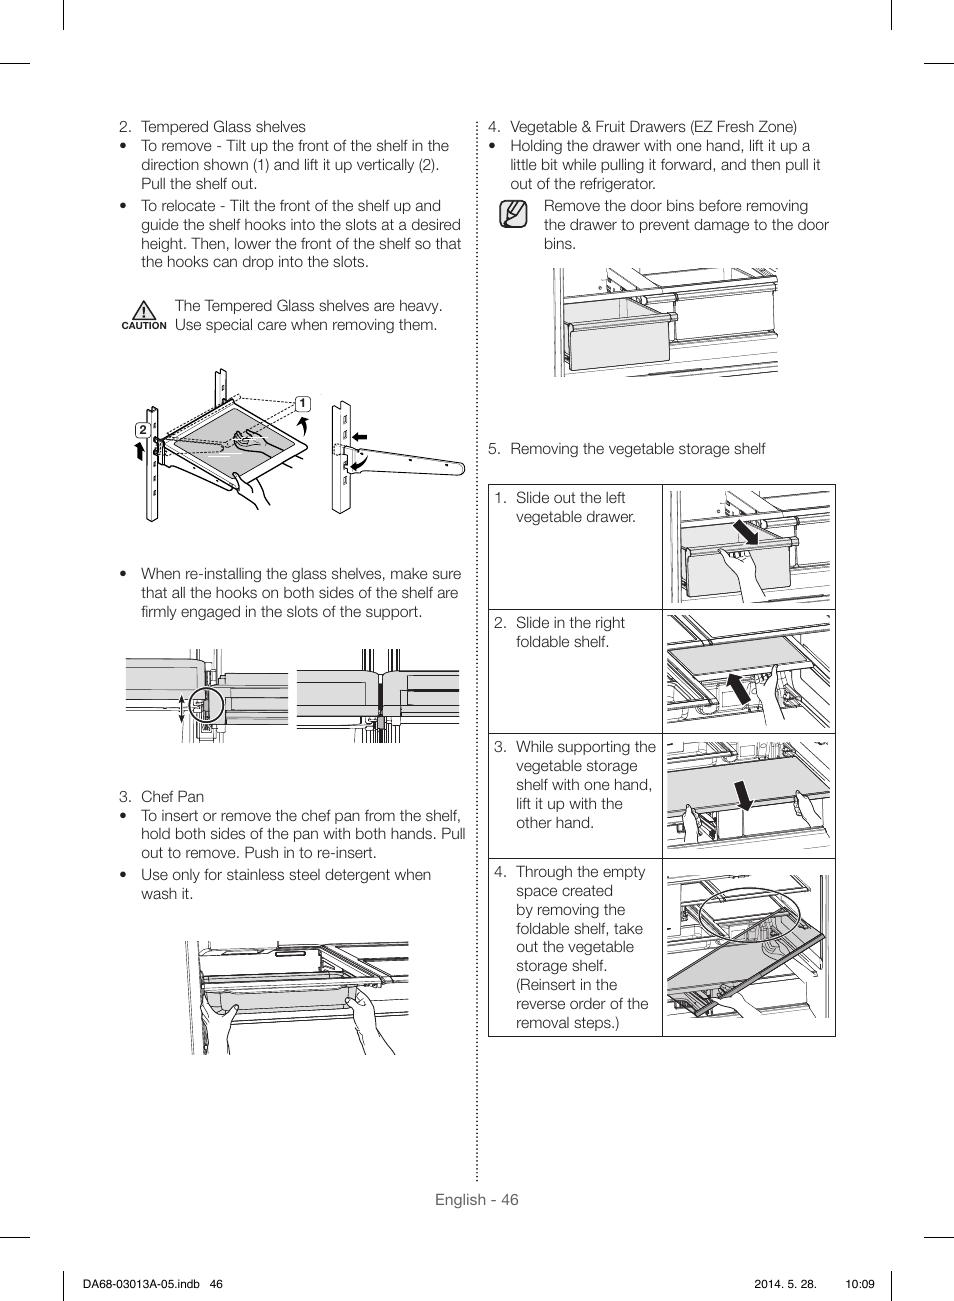 samsung rf34h9960s4 aa user manual page 46 180 original mode rh manualsdir com Drawer Construction Plastic Drawer Runners